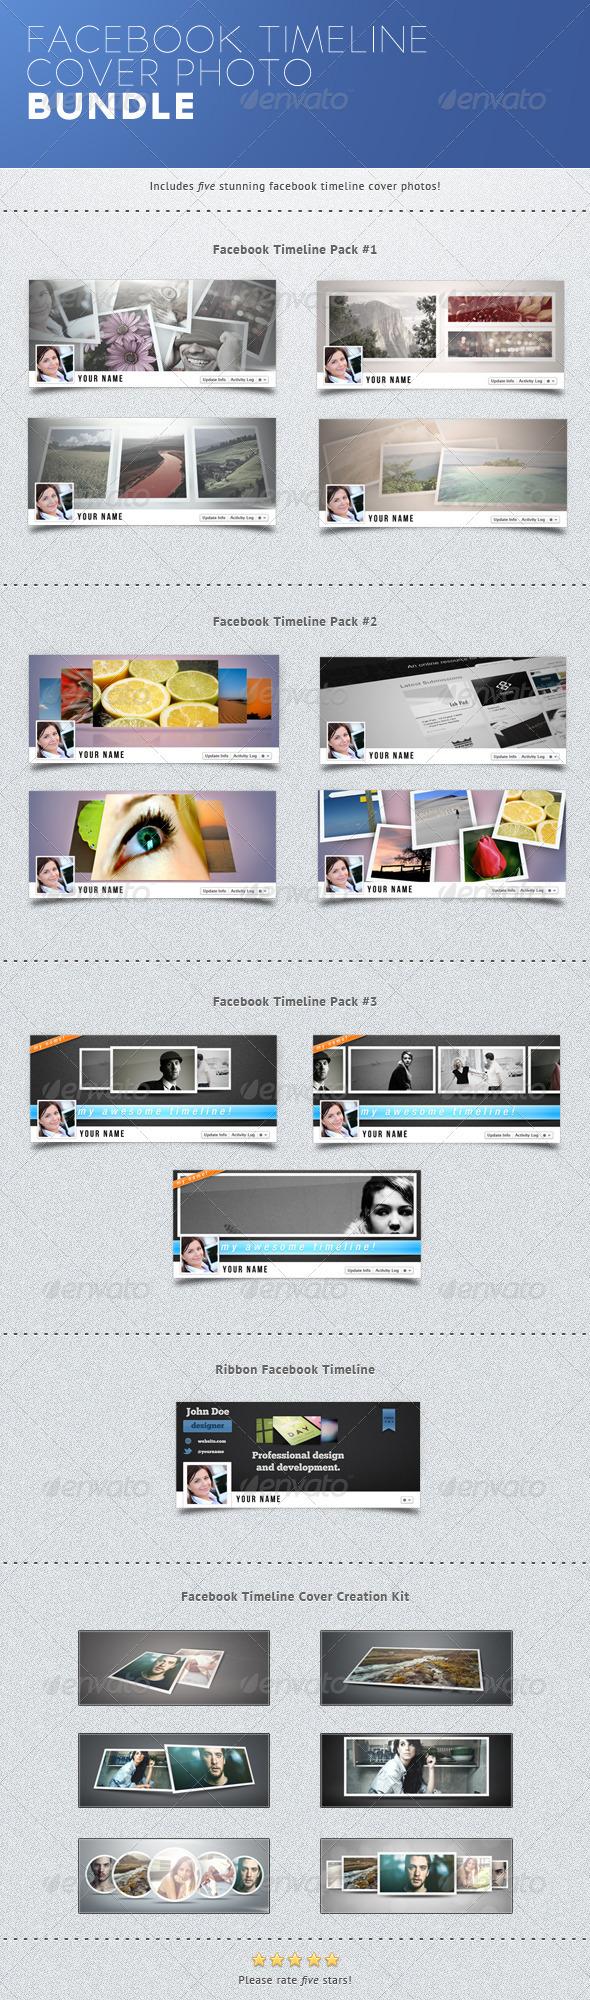 GraphicRiver Facebook Timeline Covers Bundle 2642446